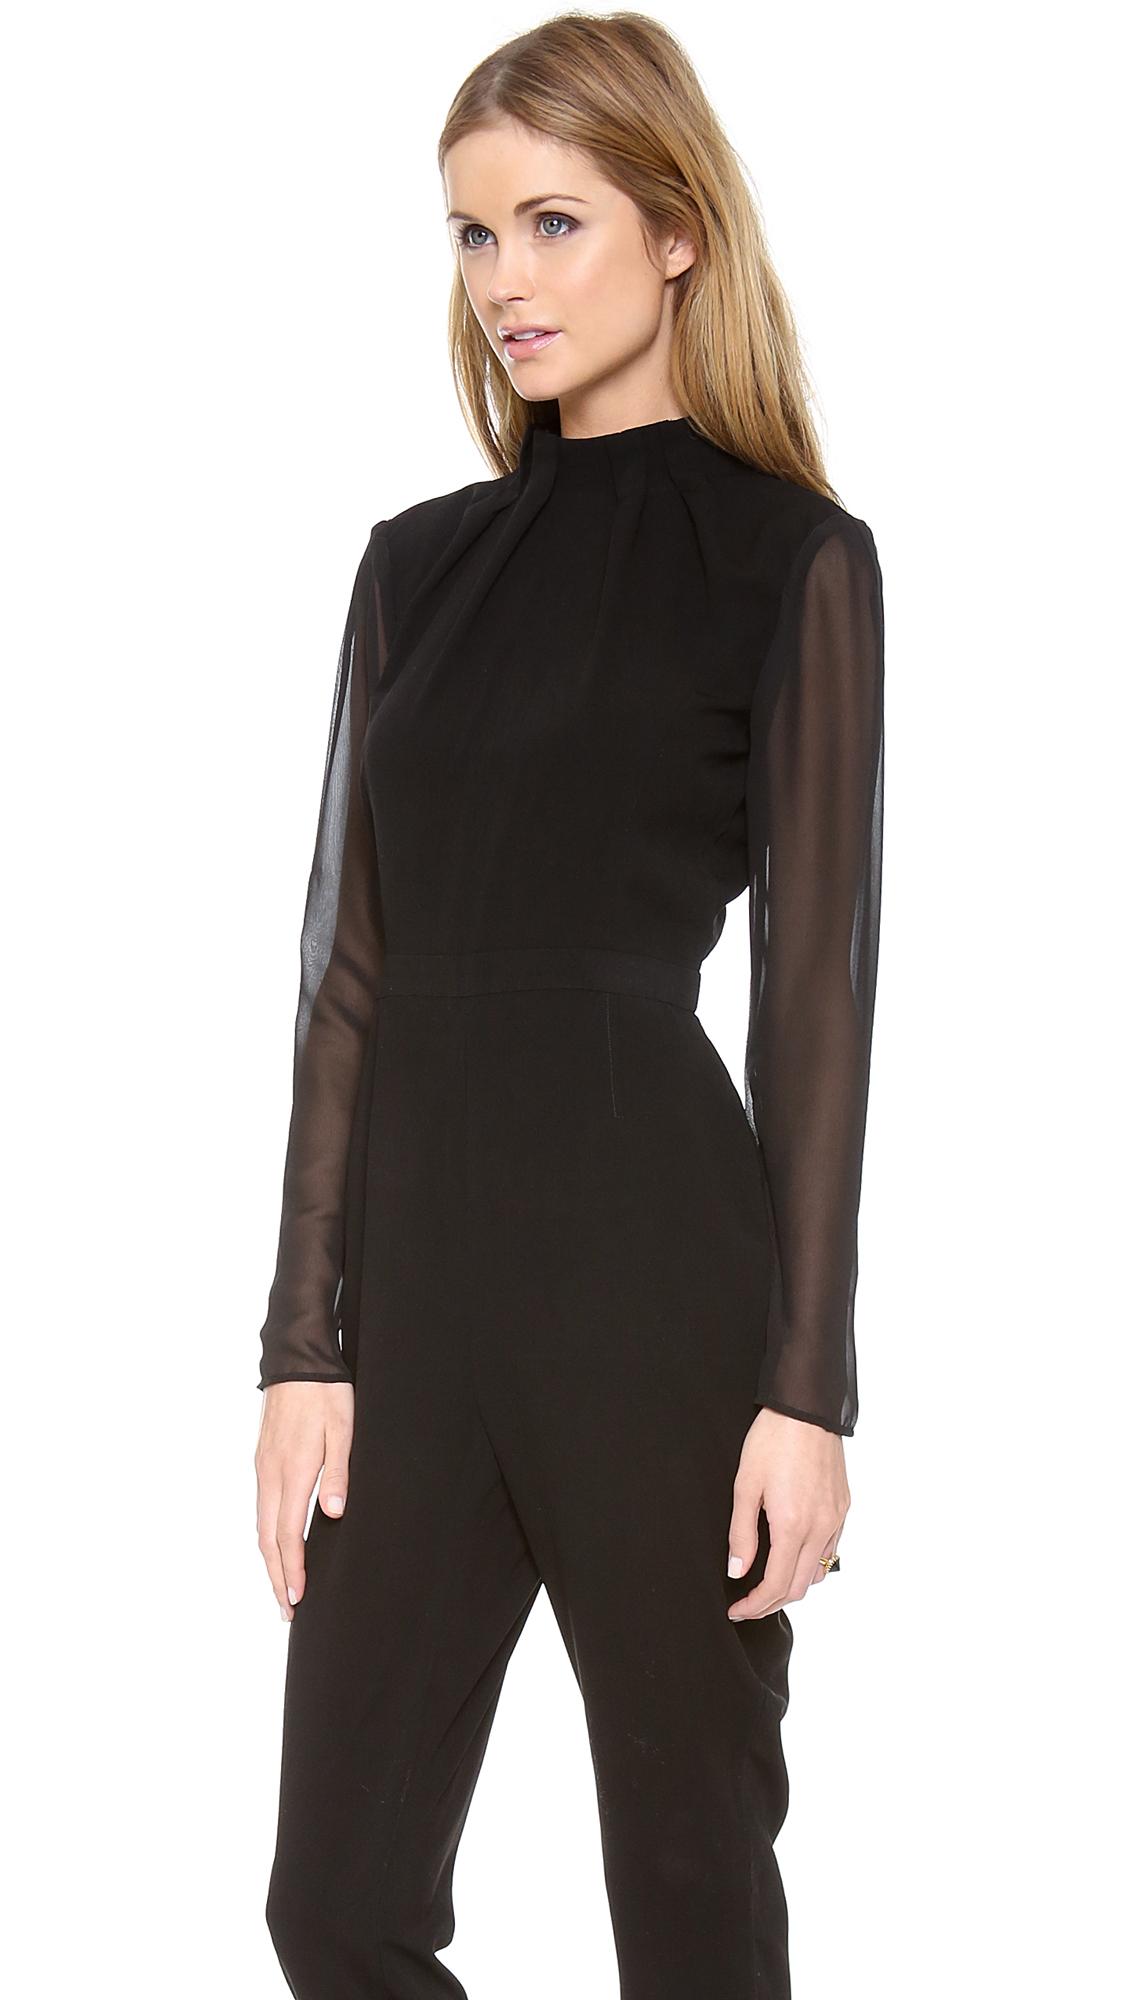 6089cea752 Lyst - Lovers + Friends Monica Rose Maxfield Jumpsuit in Black